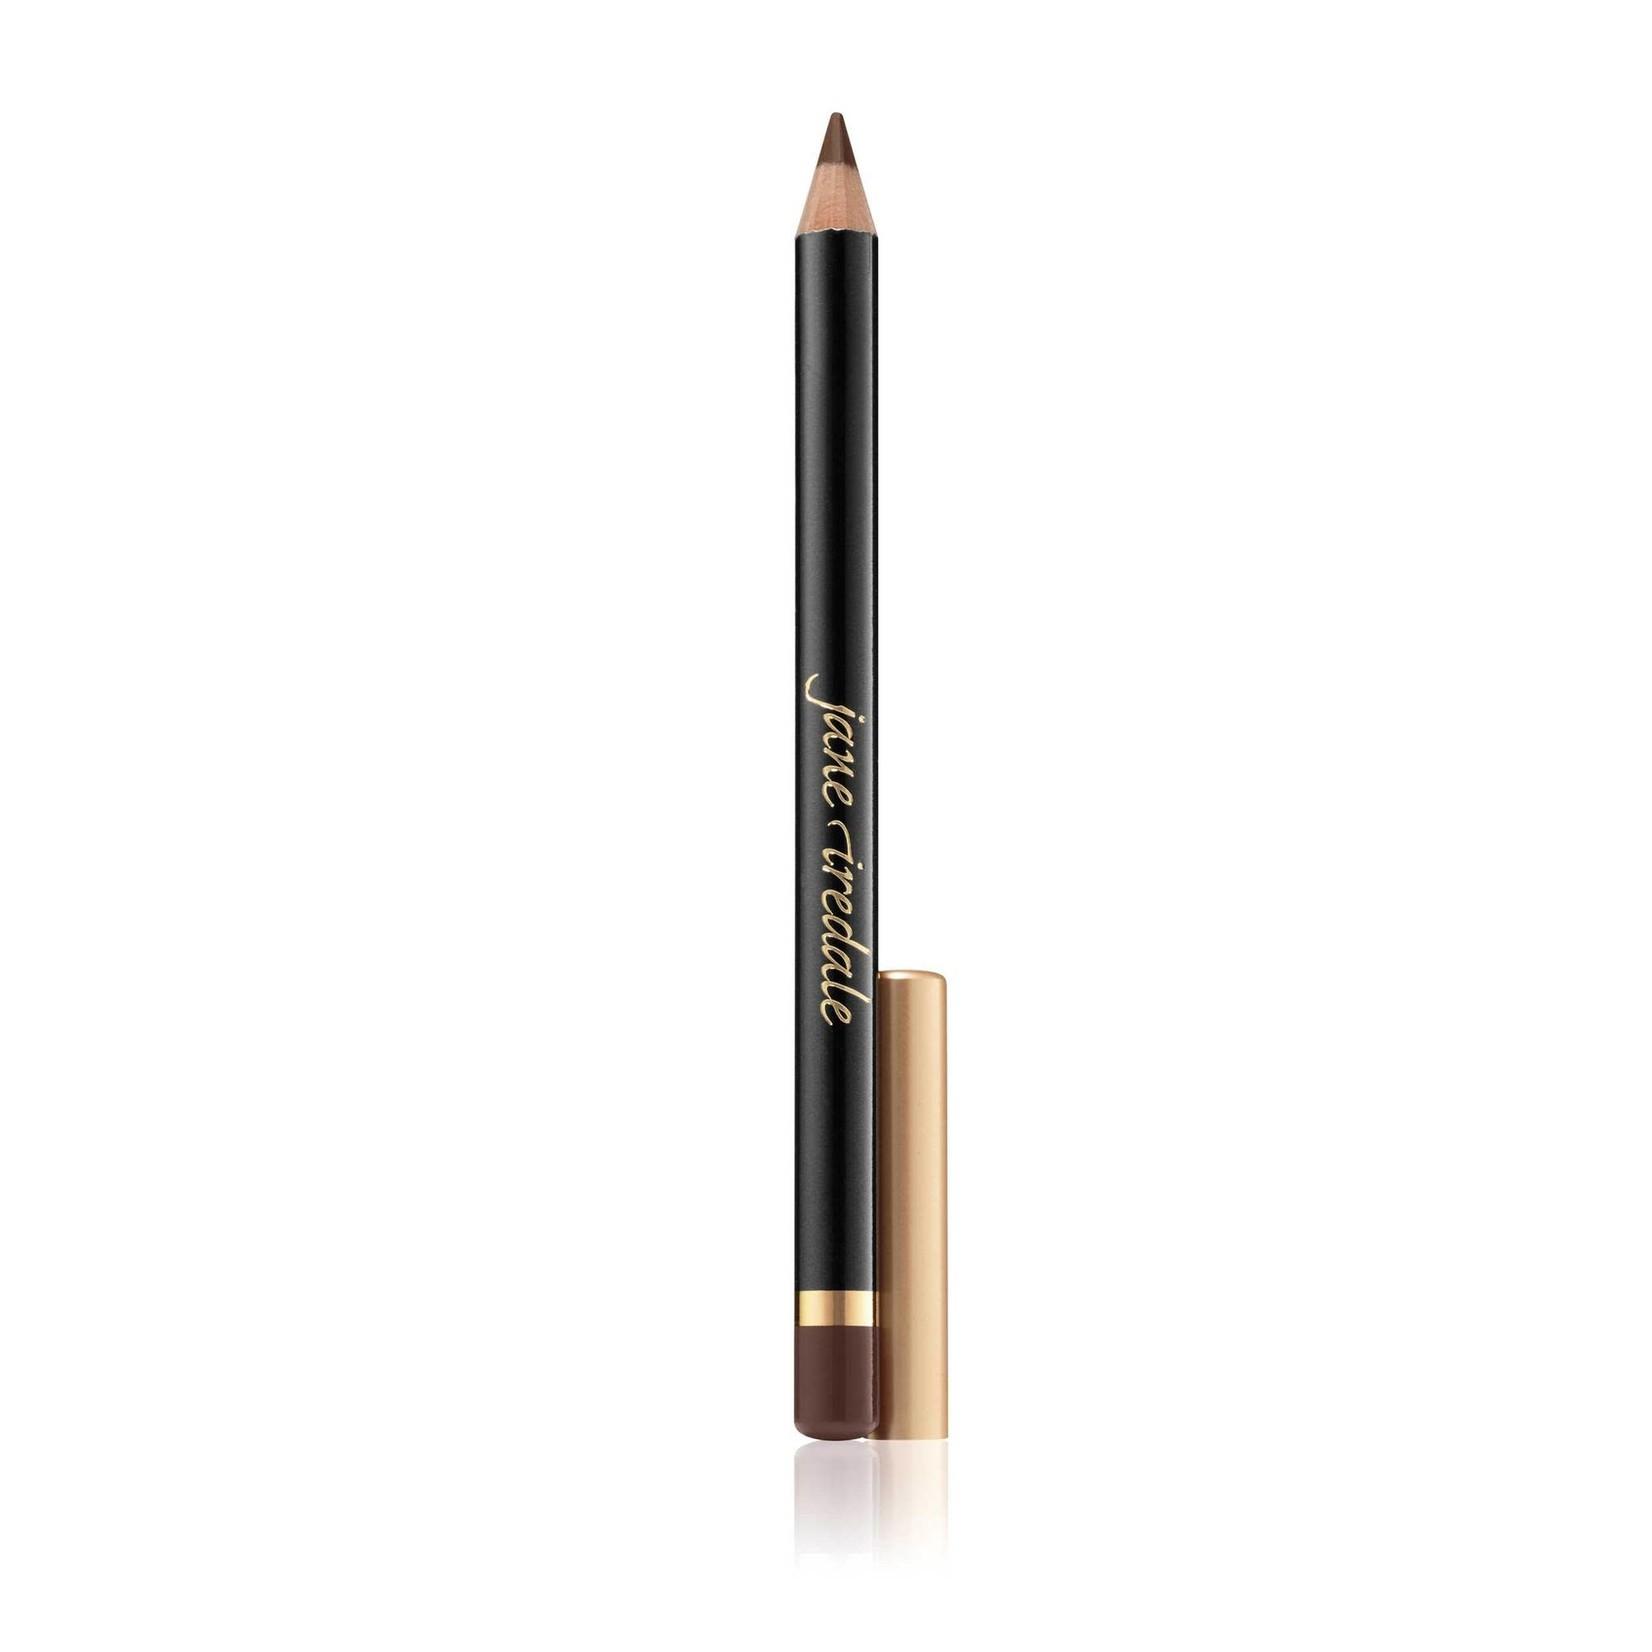 jane iredale Eye pencil basic brown